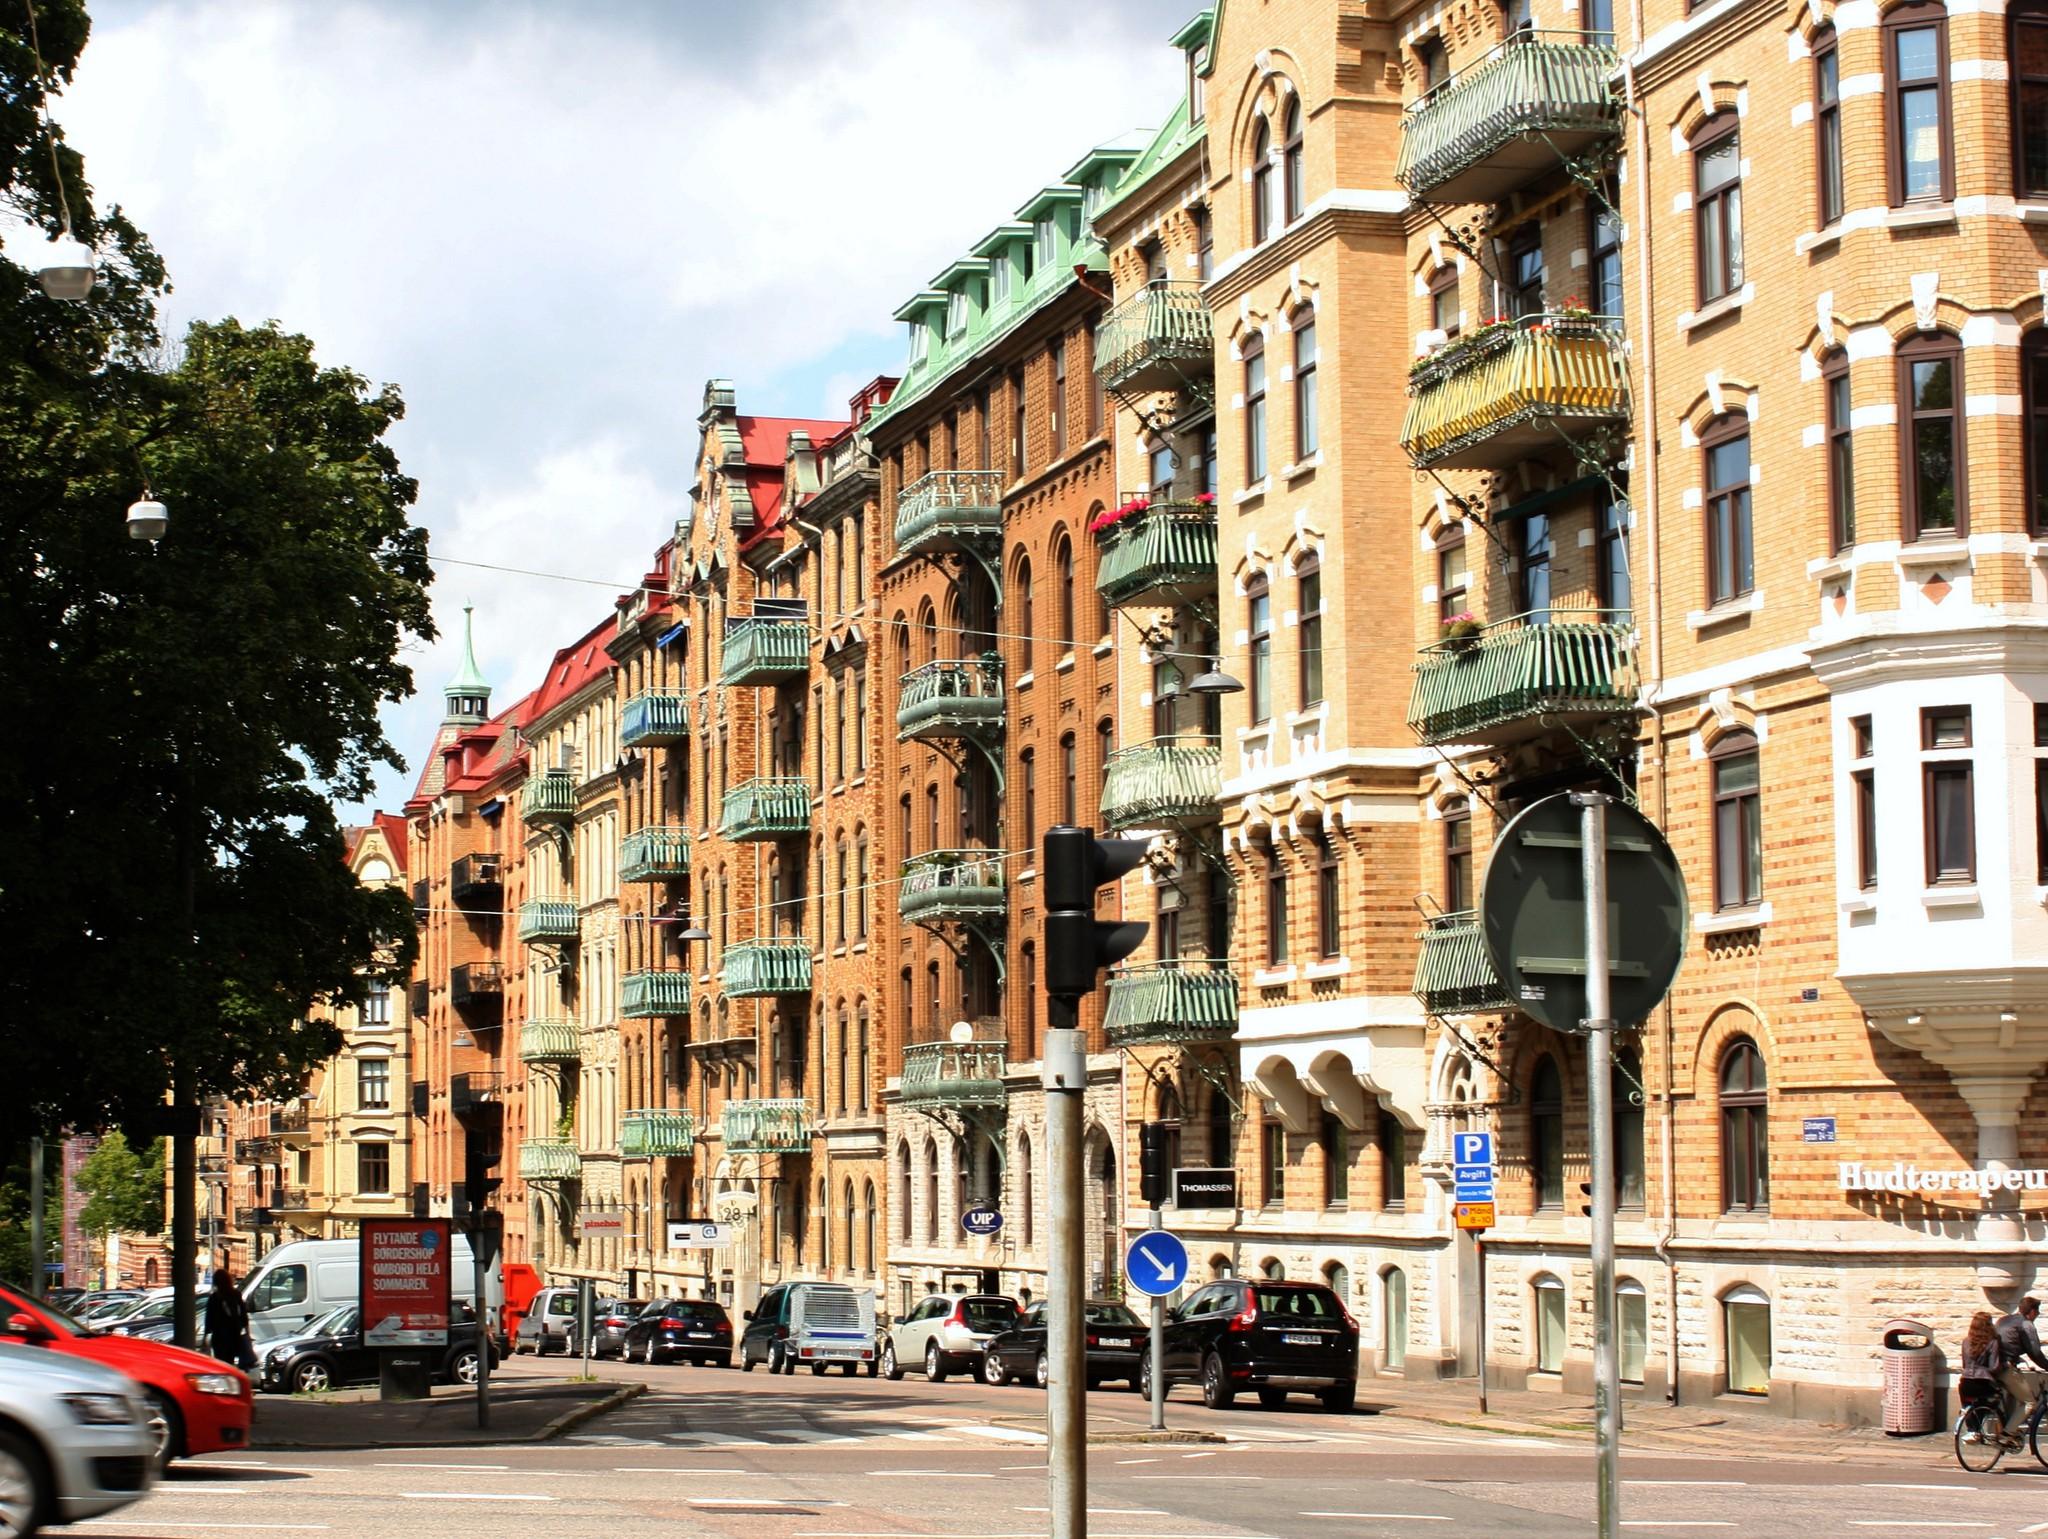 19th Century Architecture in Vasastan   © Blondinrikard Fröberg / flickr